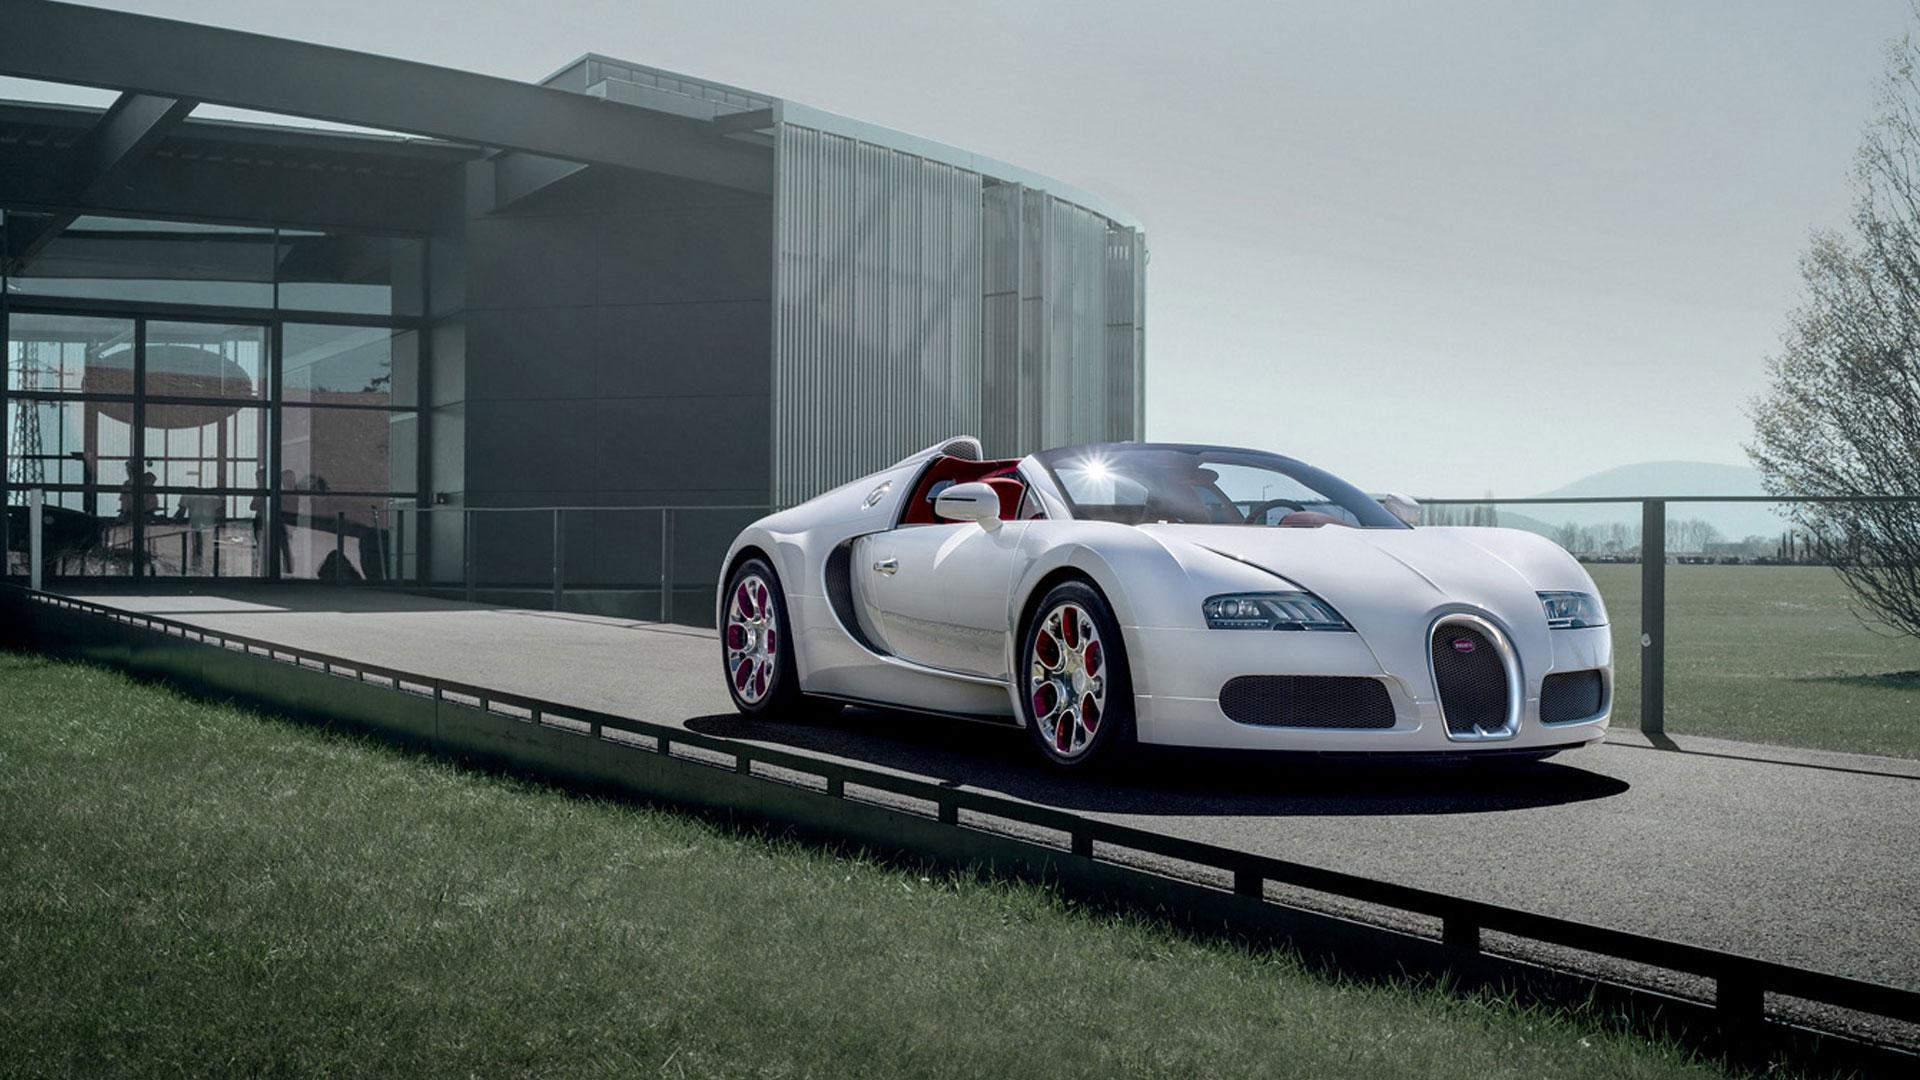 Wallpaper-Bugatti-Veyron-Grand-Sport-custom